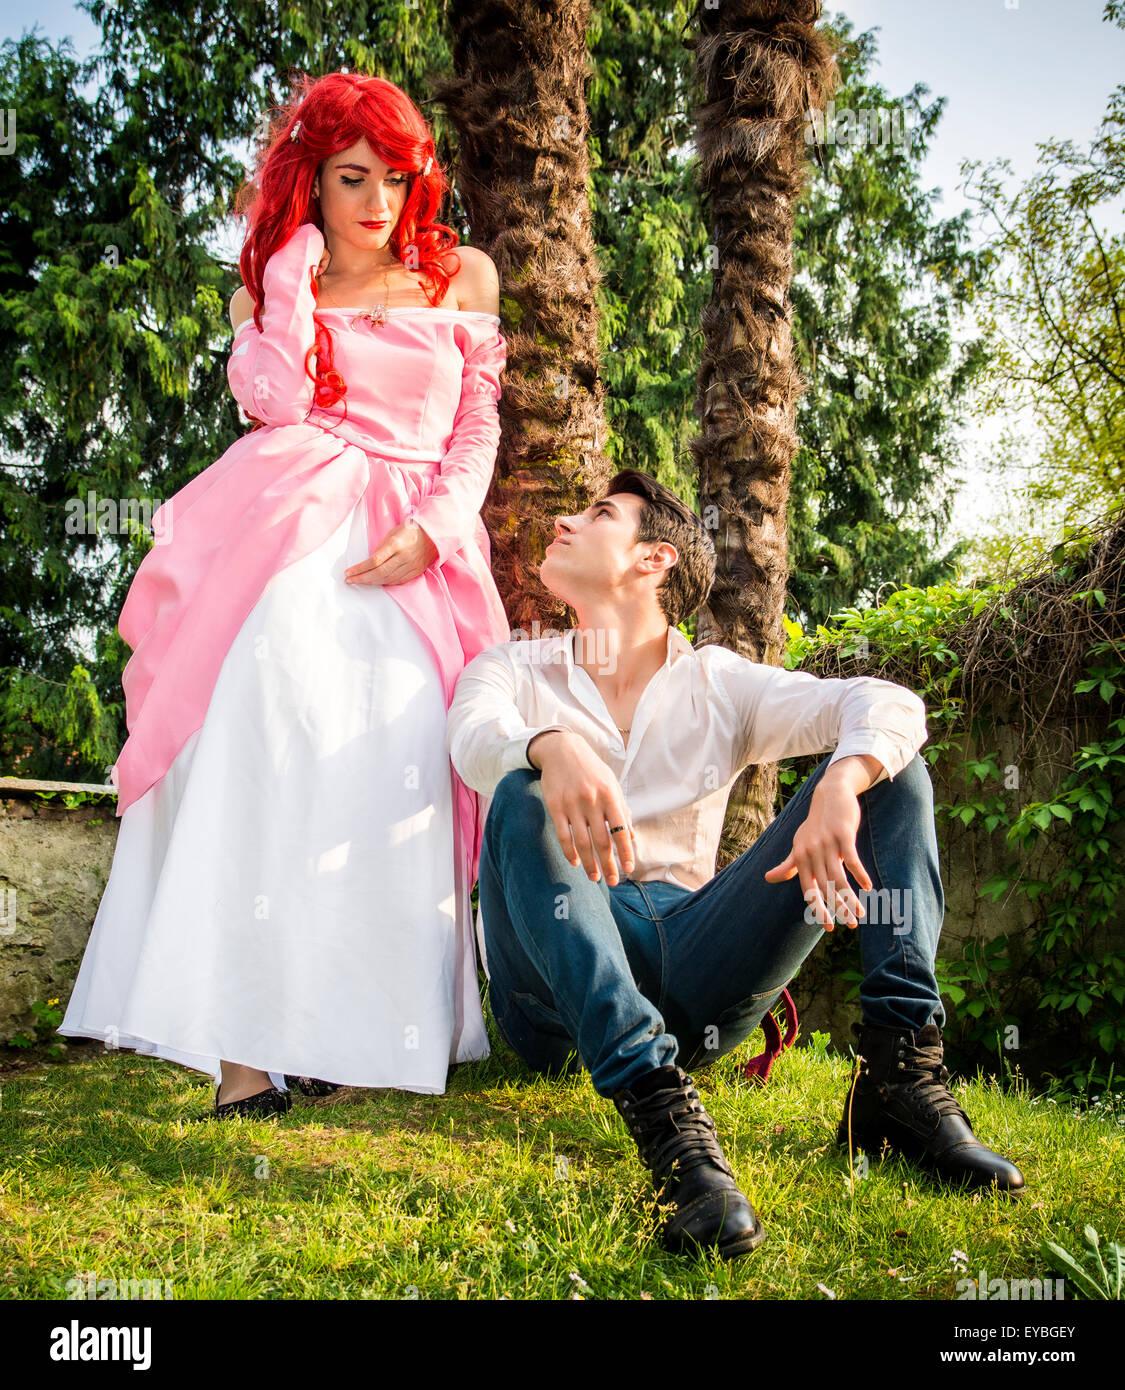 Romantic Fairy Tales